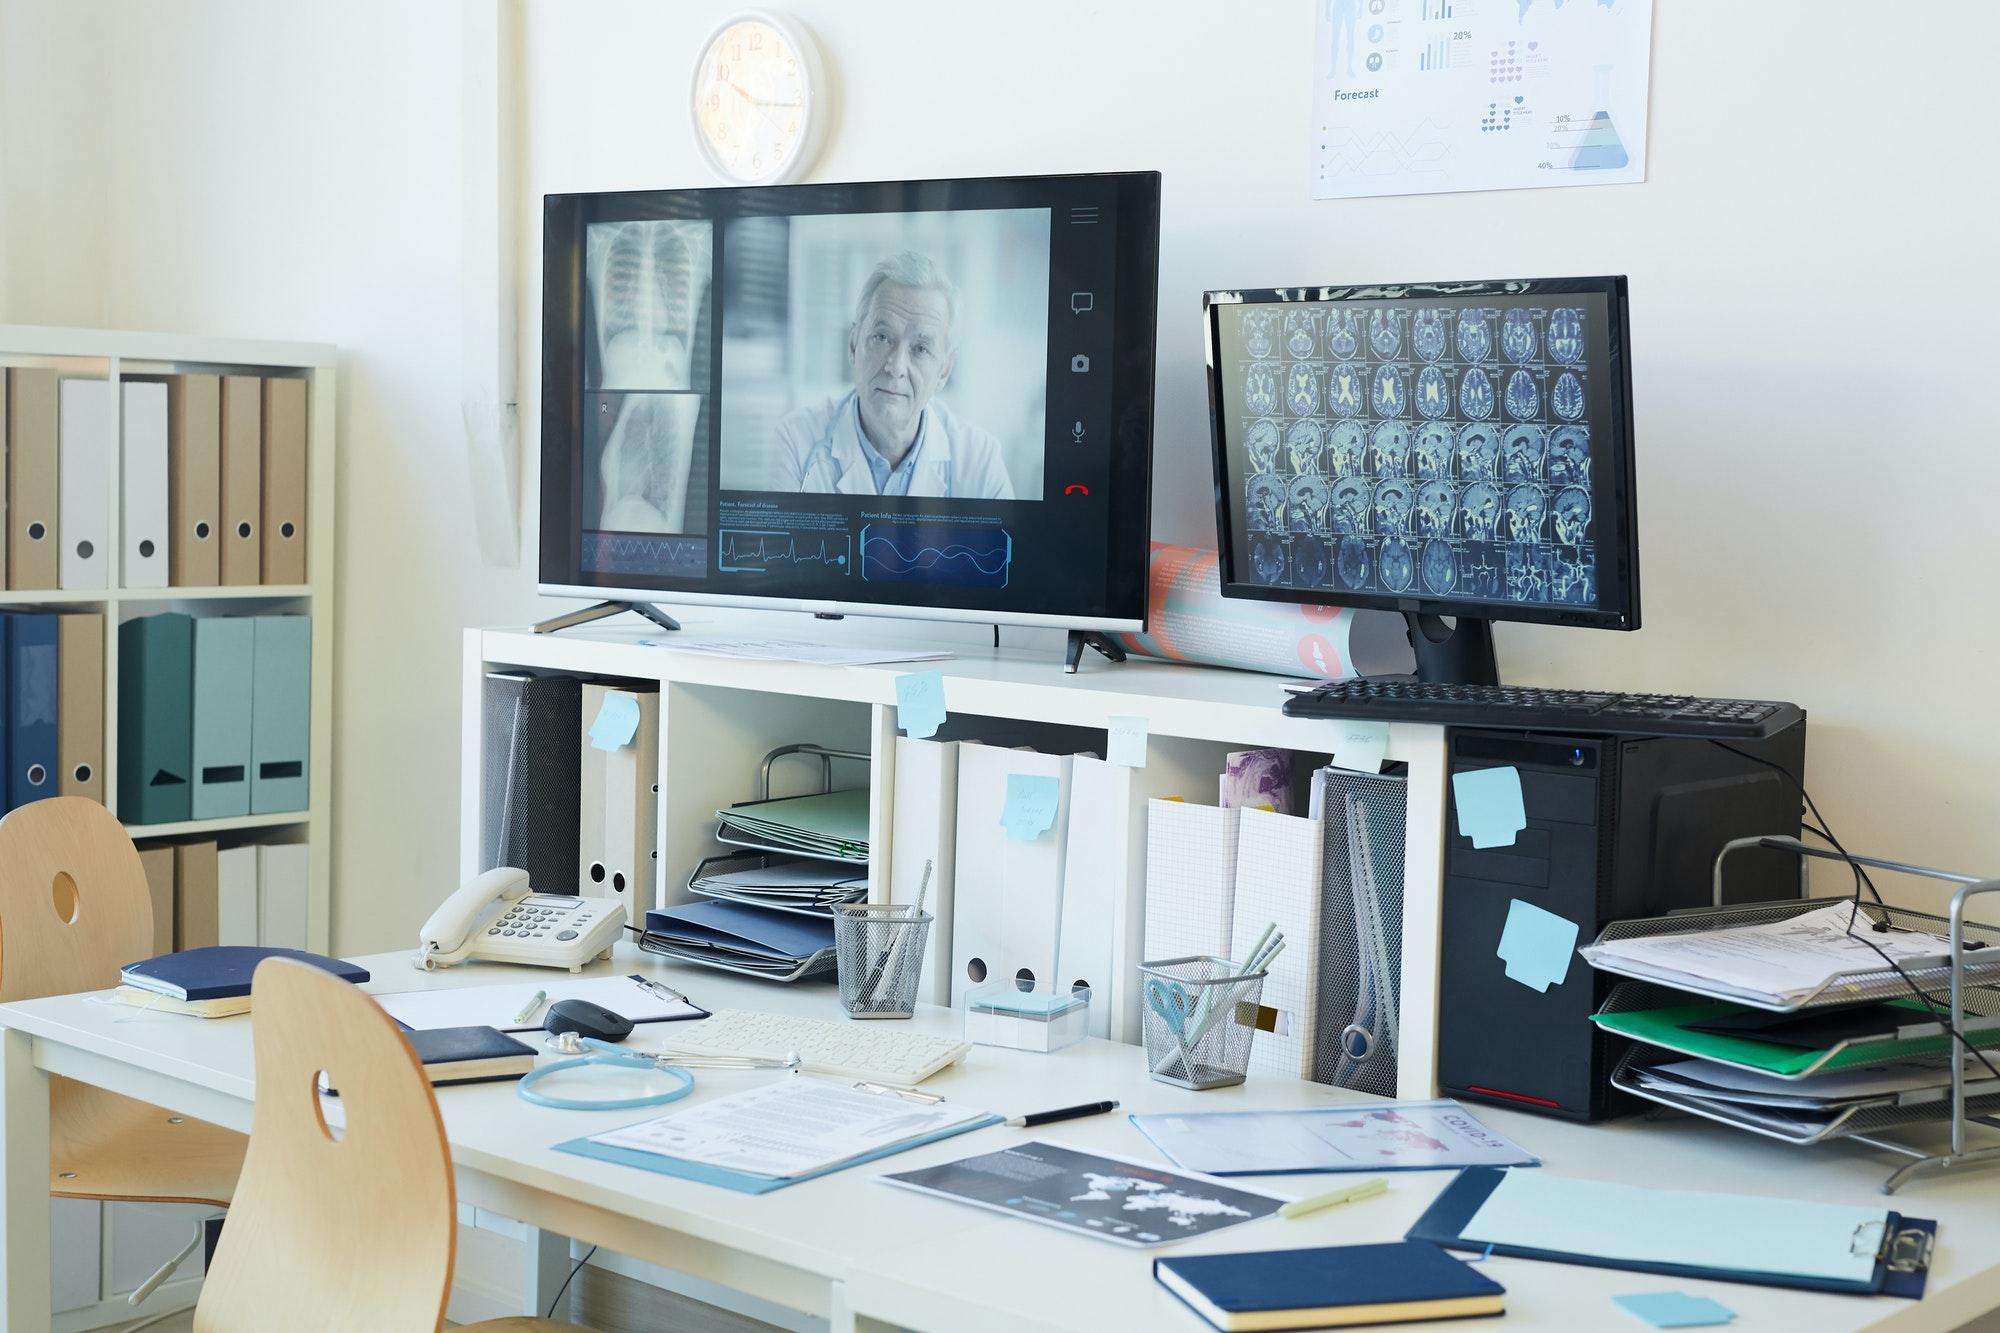 Telemedicine Equipment in Clinic